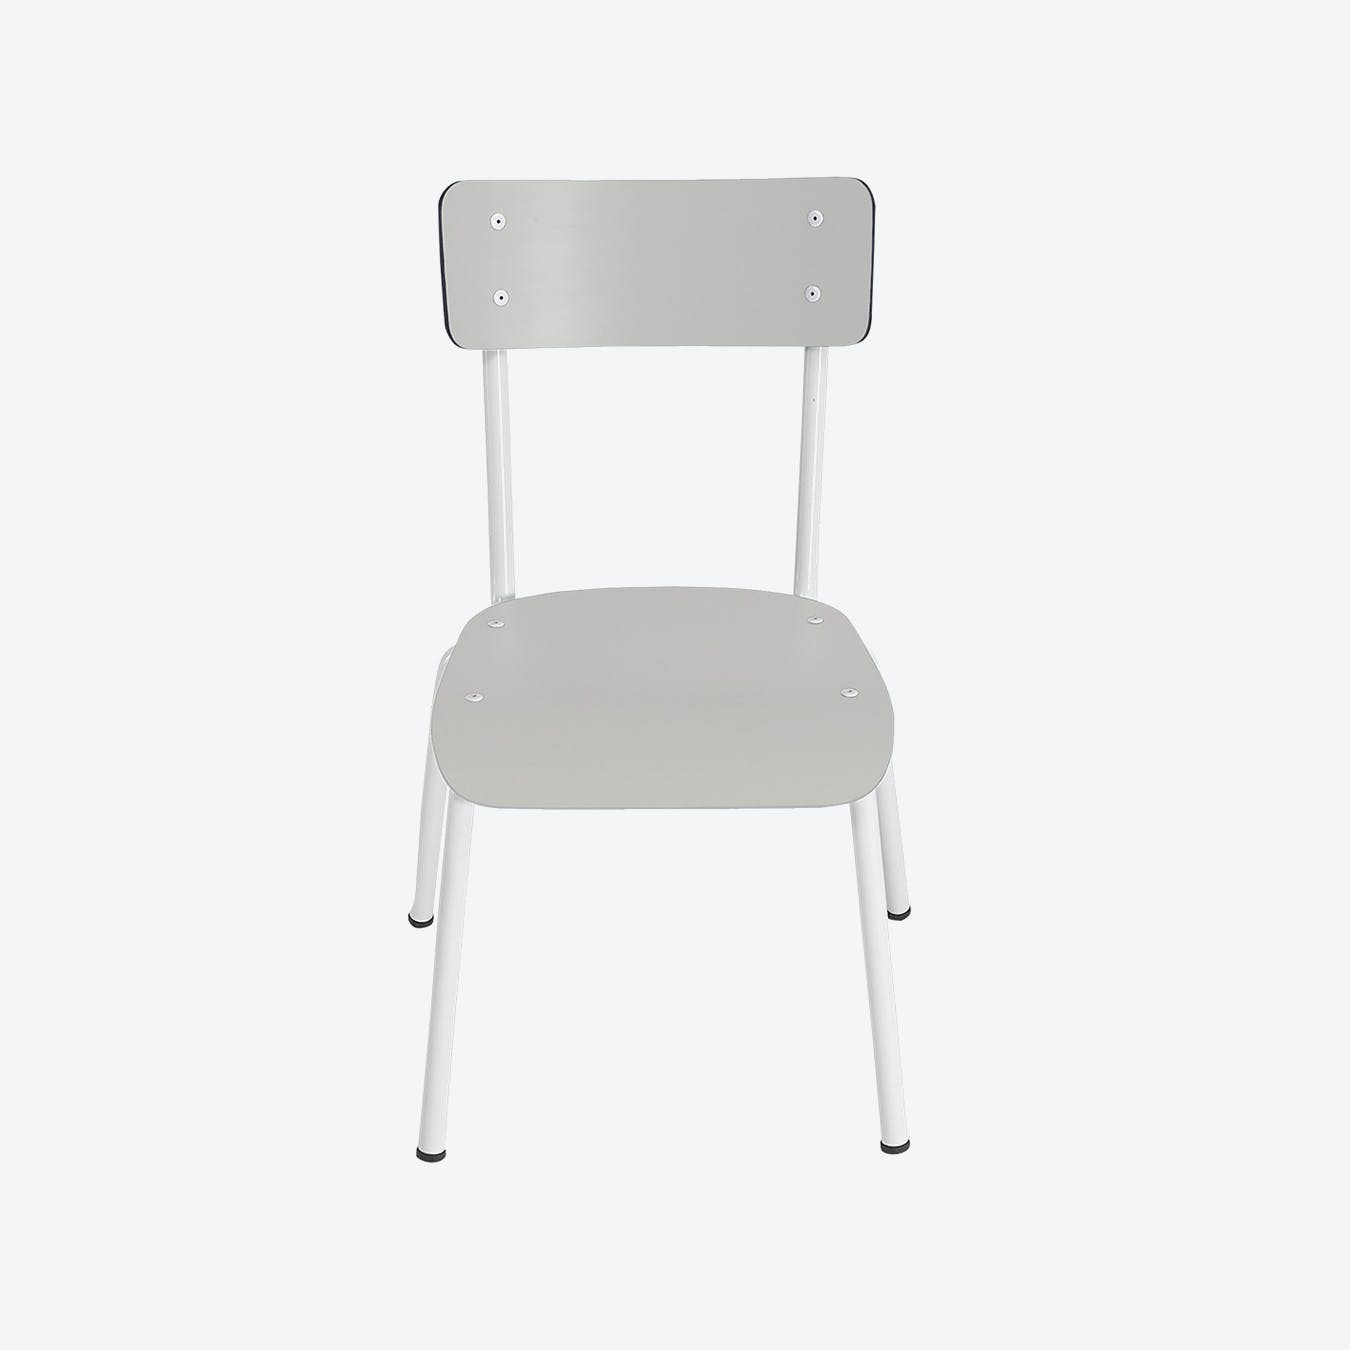 Colette Elementary Chair - Light Grey